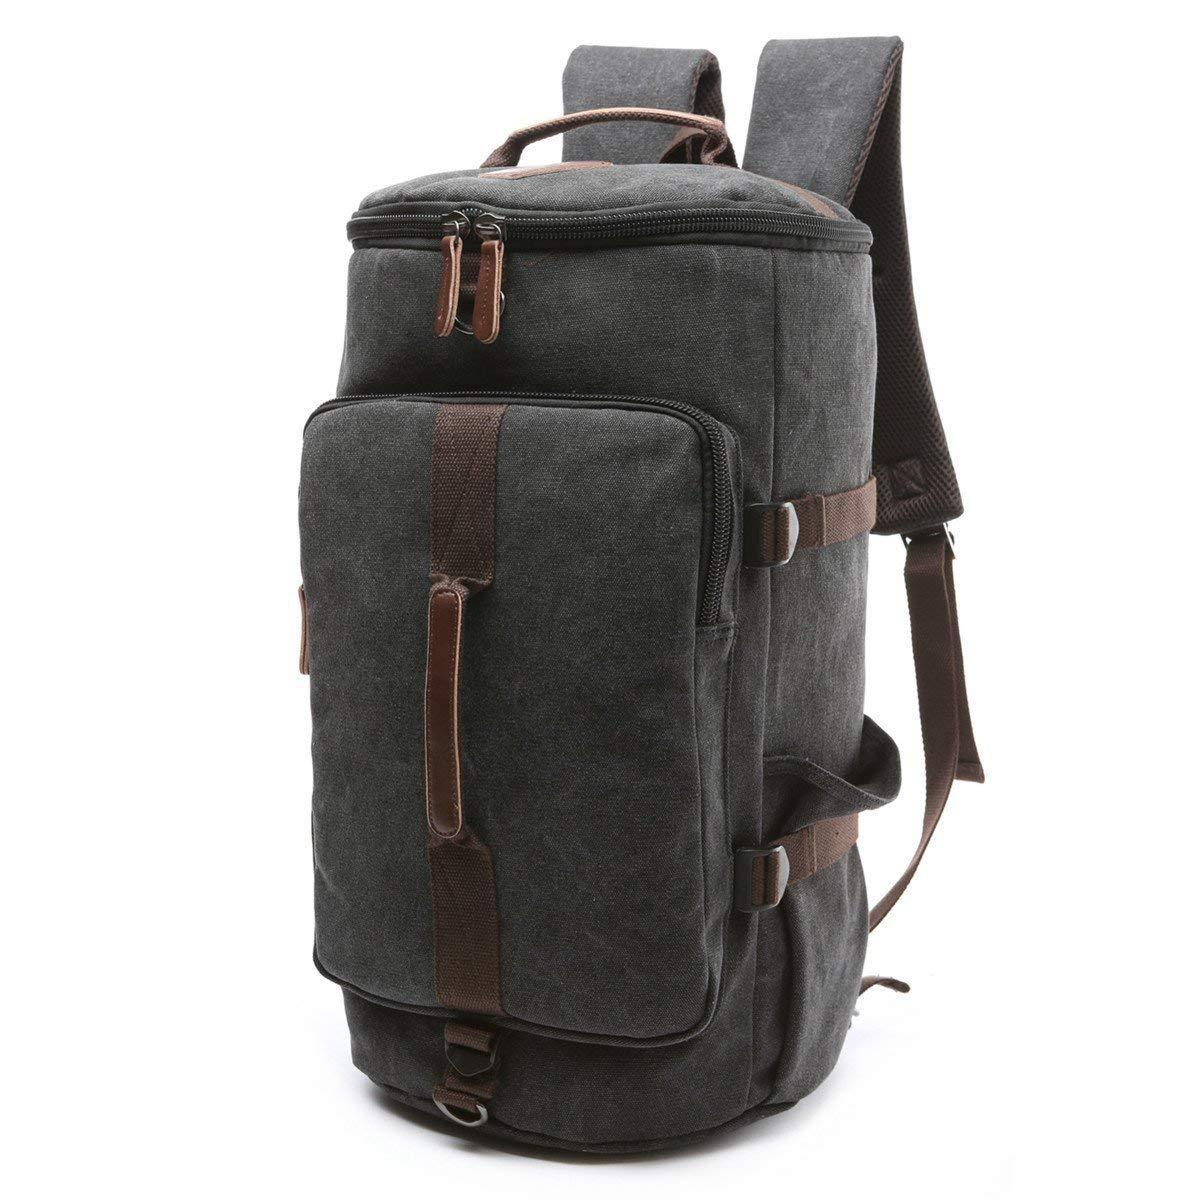 BAOSHA HB-26 3-Ways Vintage Canvas Men Holdall Weekend Travel Duffel Bag Backpack Messenger Shoulder Bags Convertible Travel Hiking Rucksack Weekender Overnight Bag Handbag (Black)